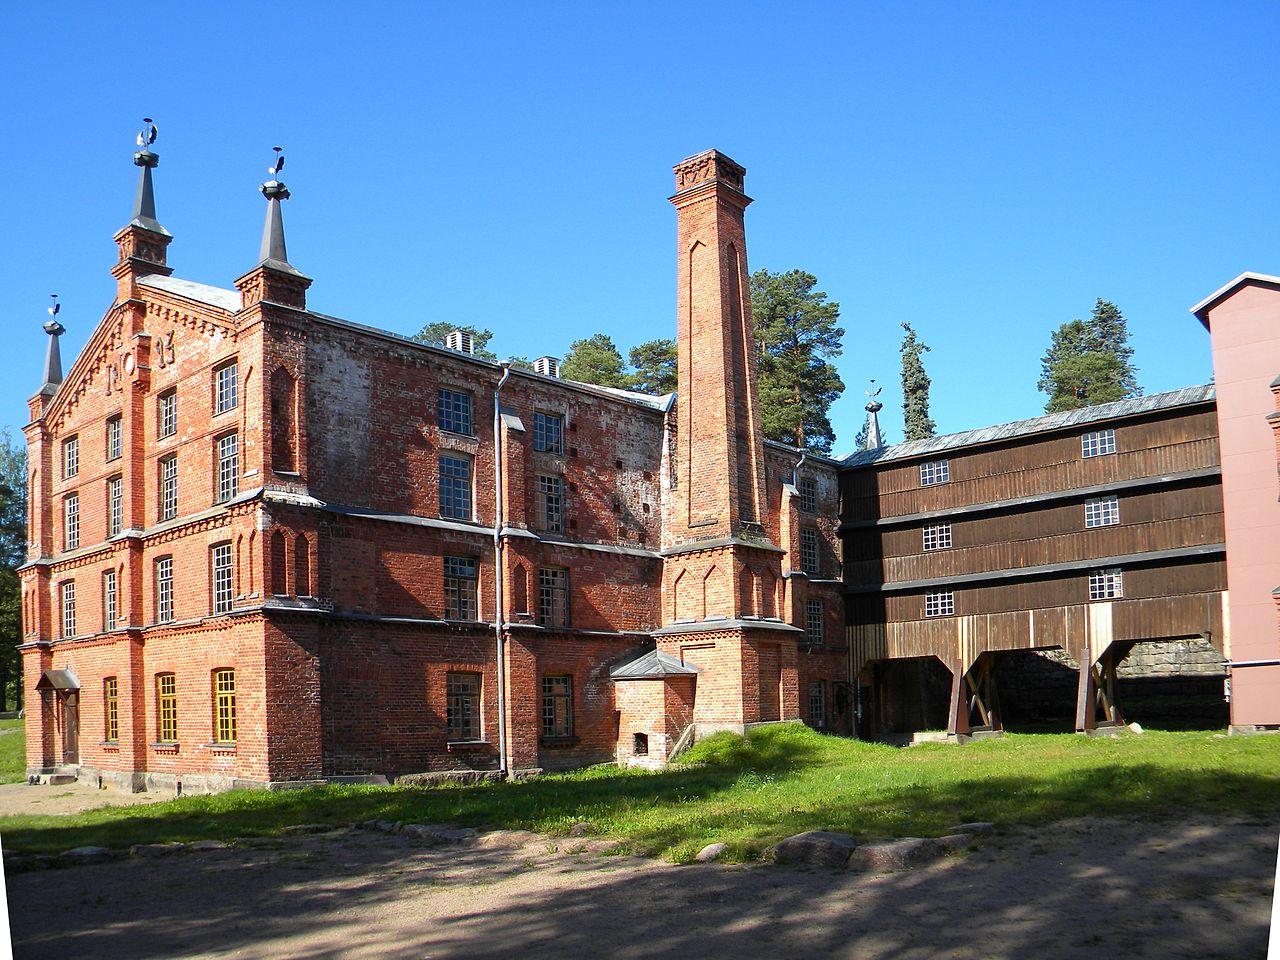 Verla Mill, Jaala, Finland